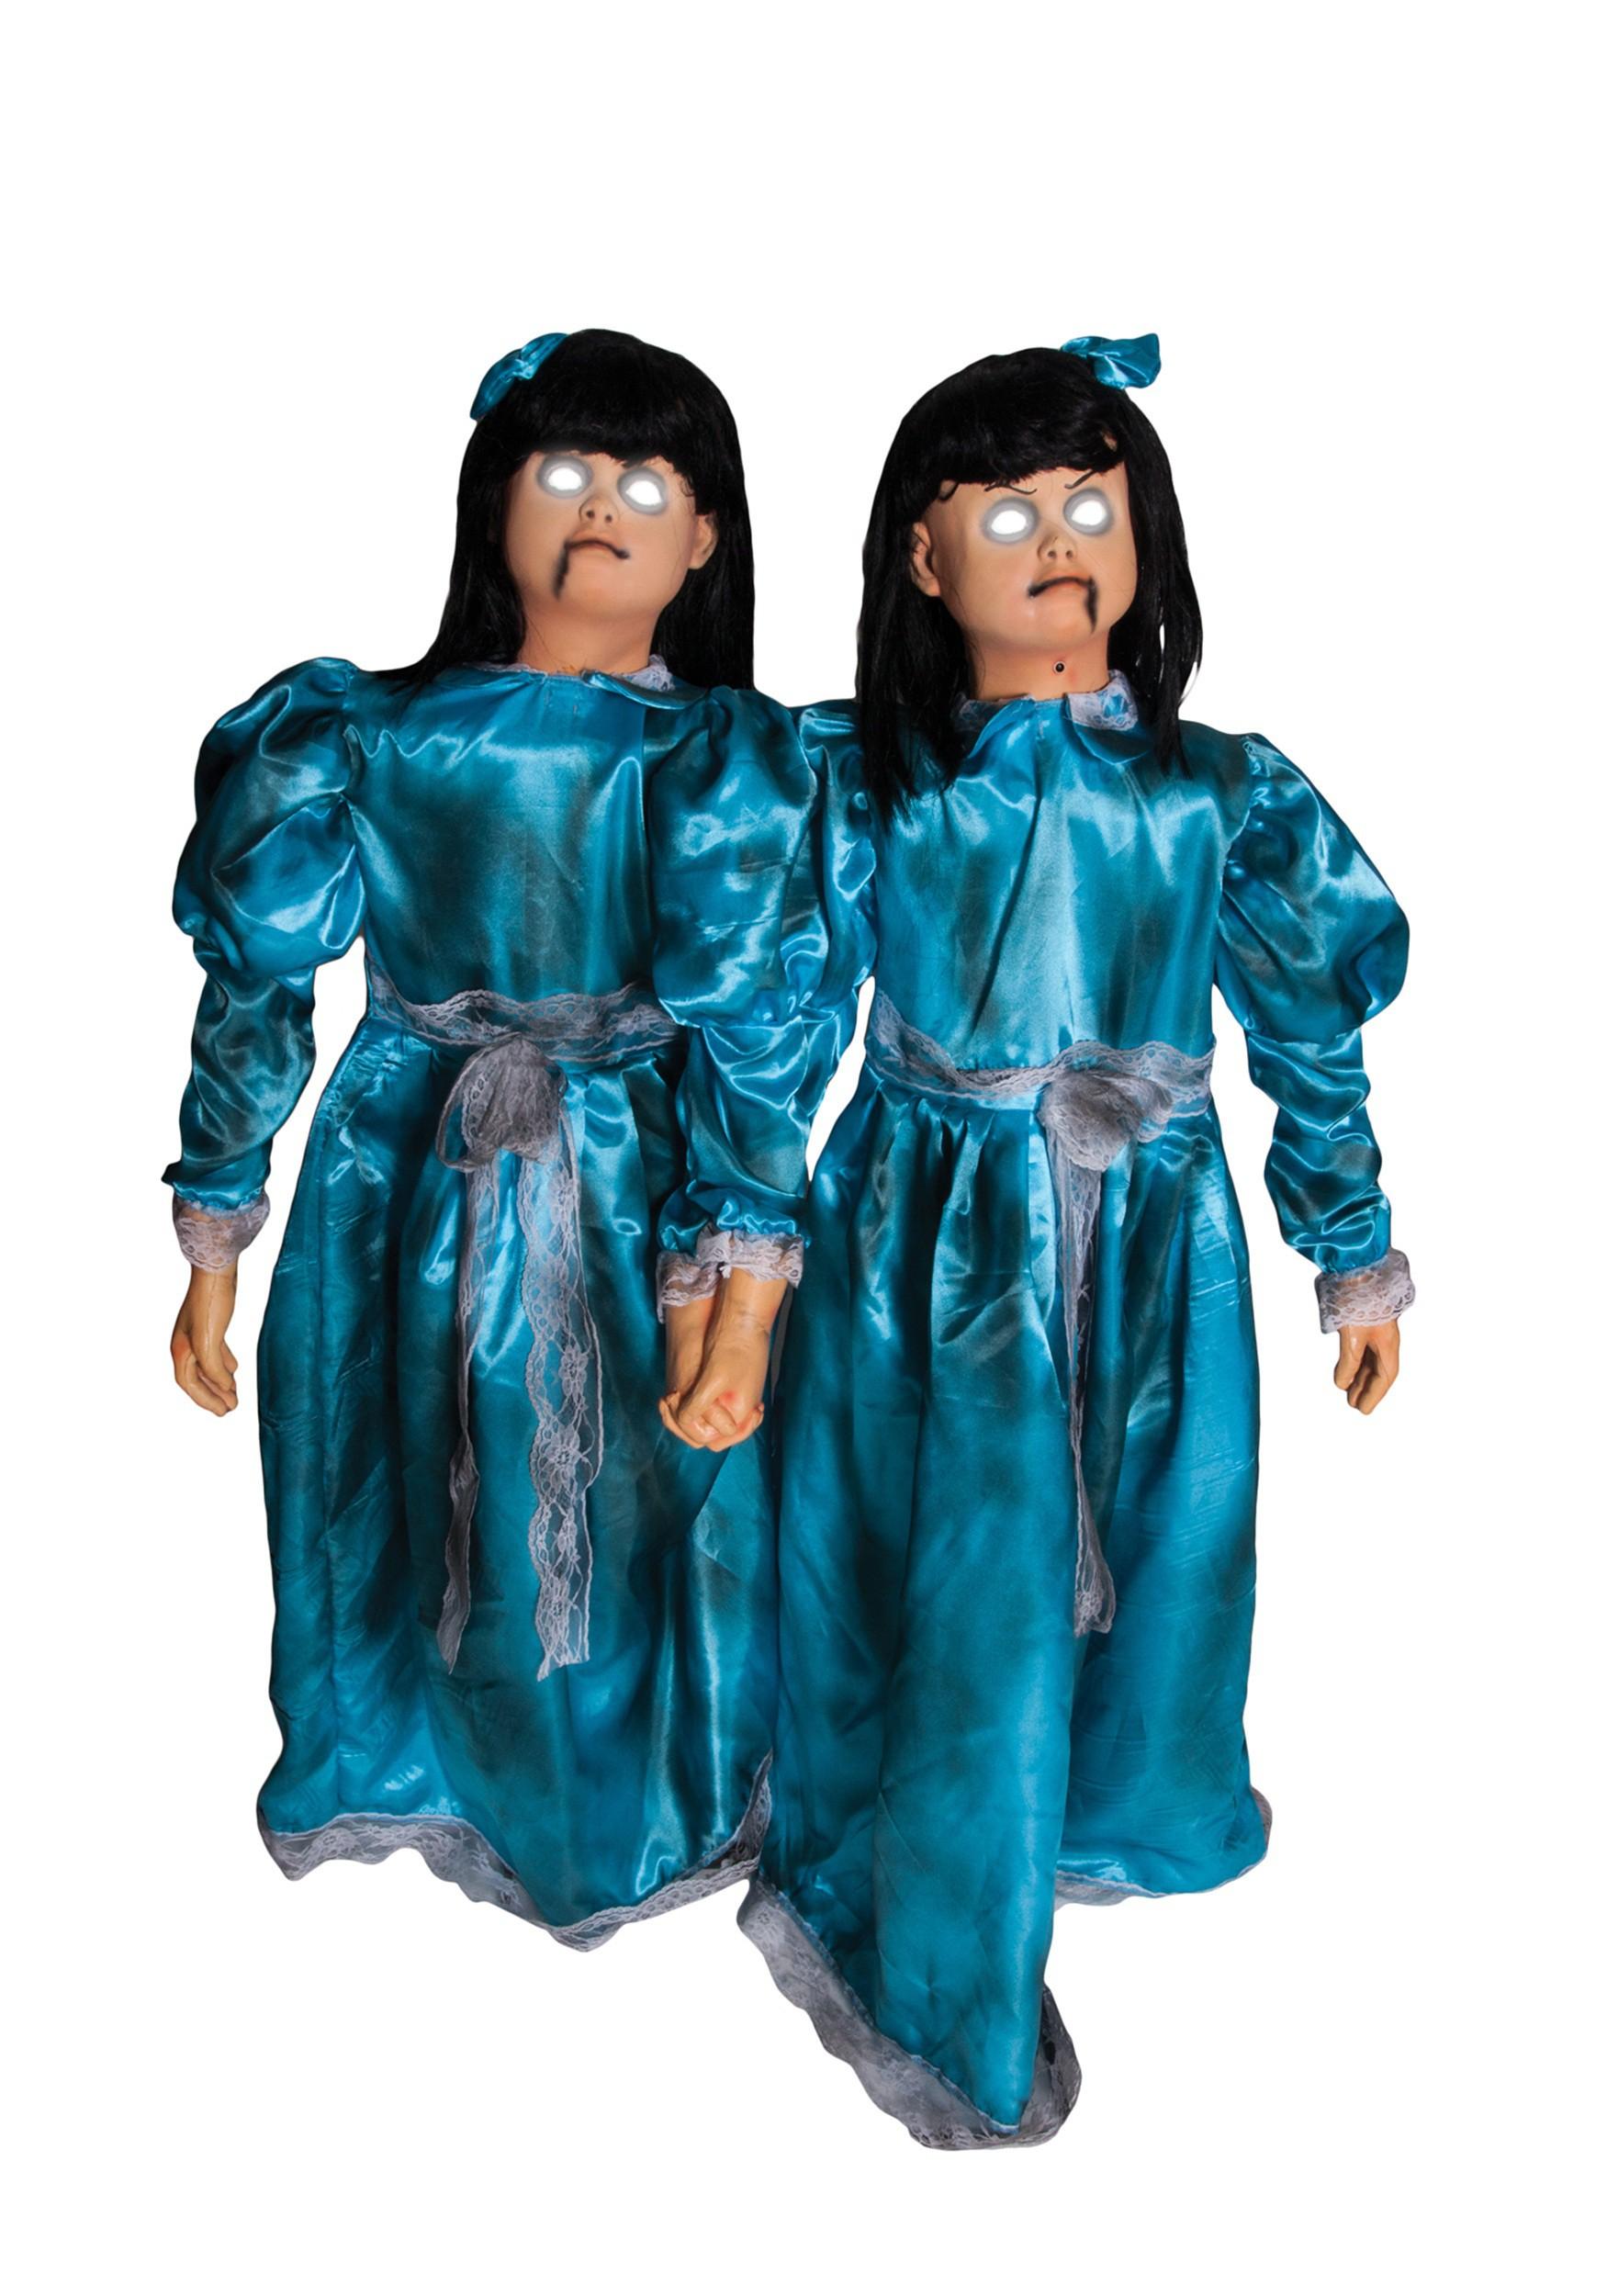 Animated Evil Twins Decoration